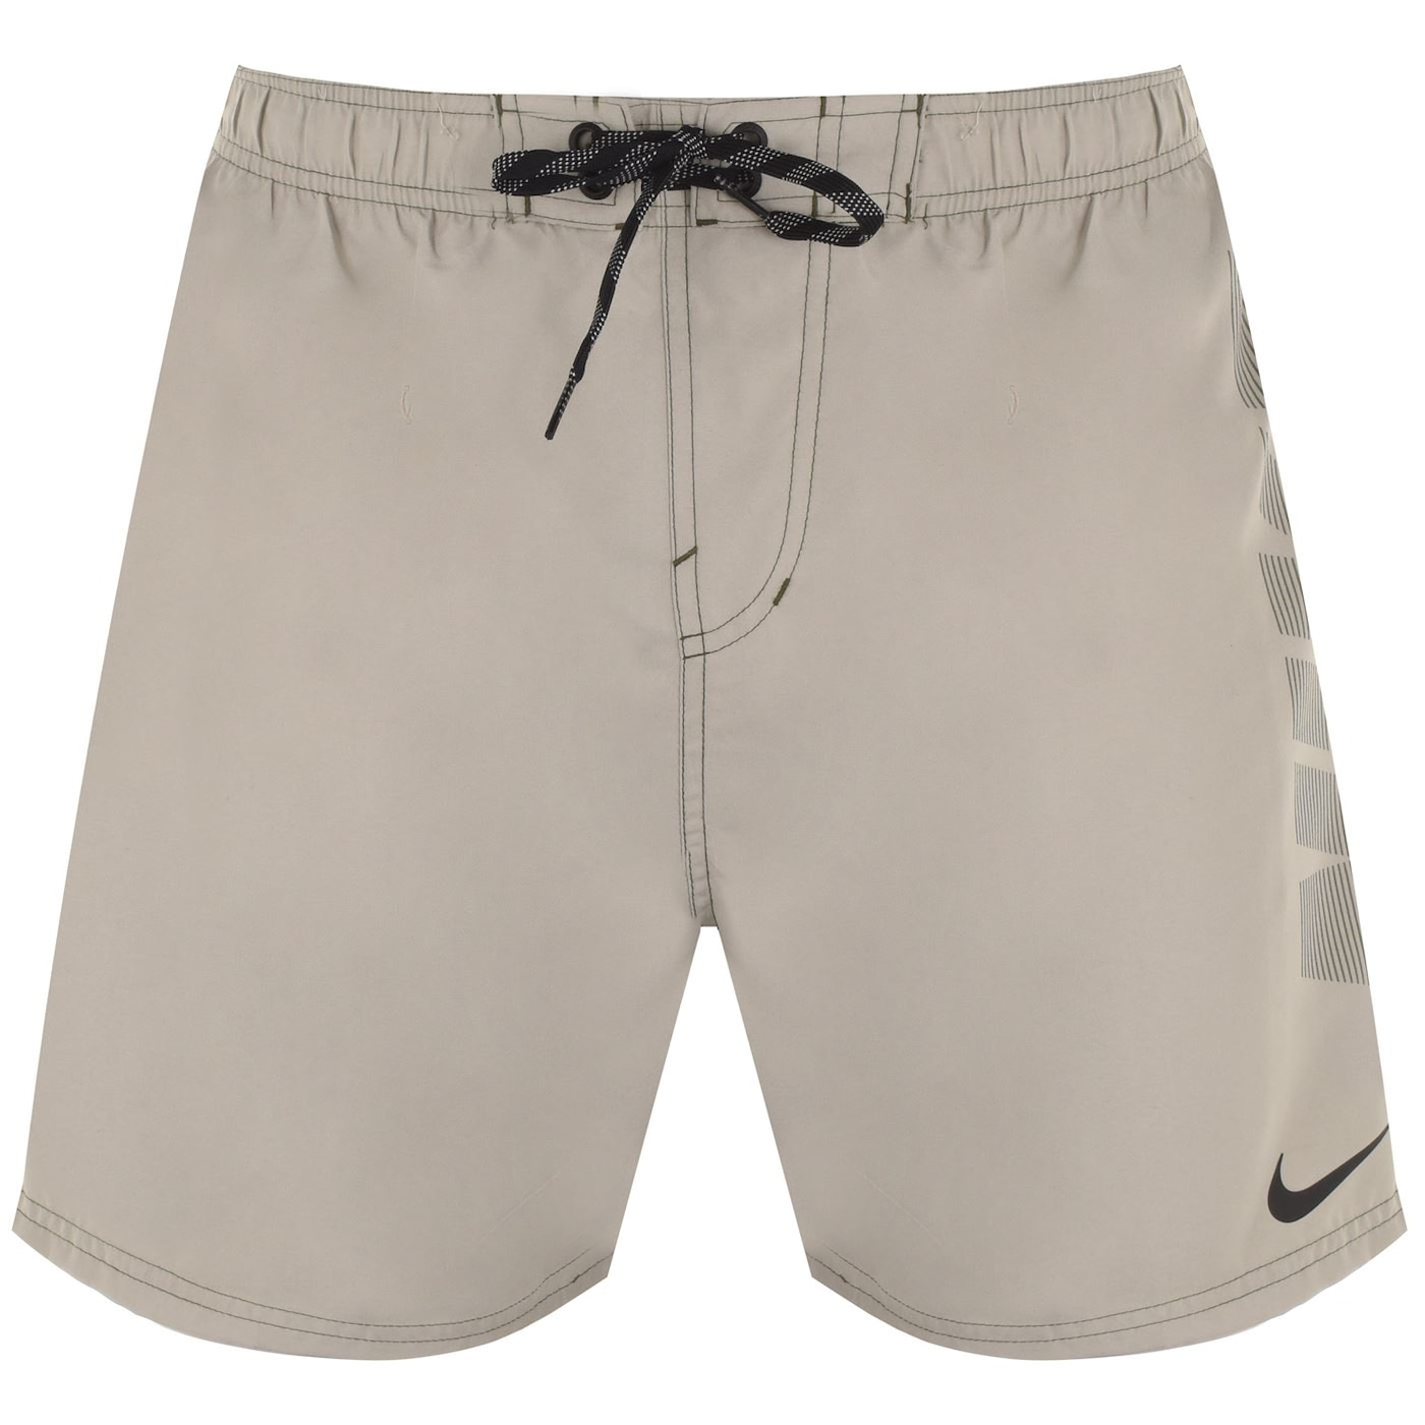 Nike Rift Vital Swim Shorts Mens